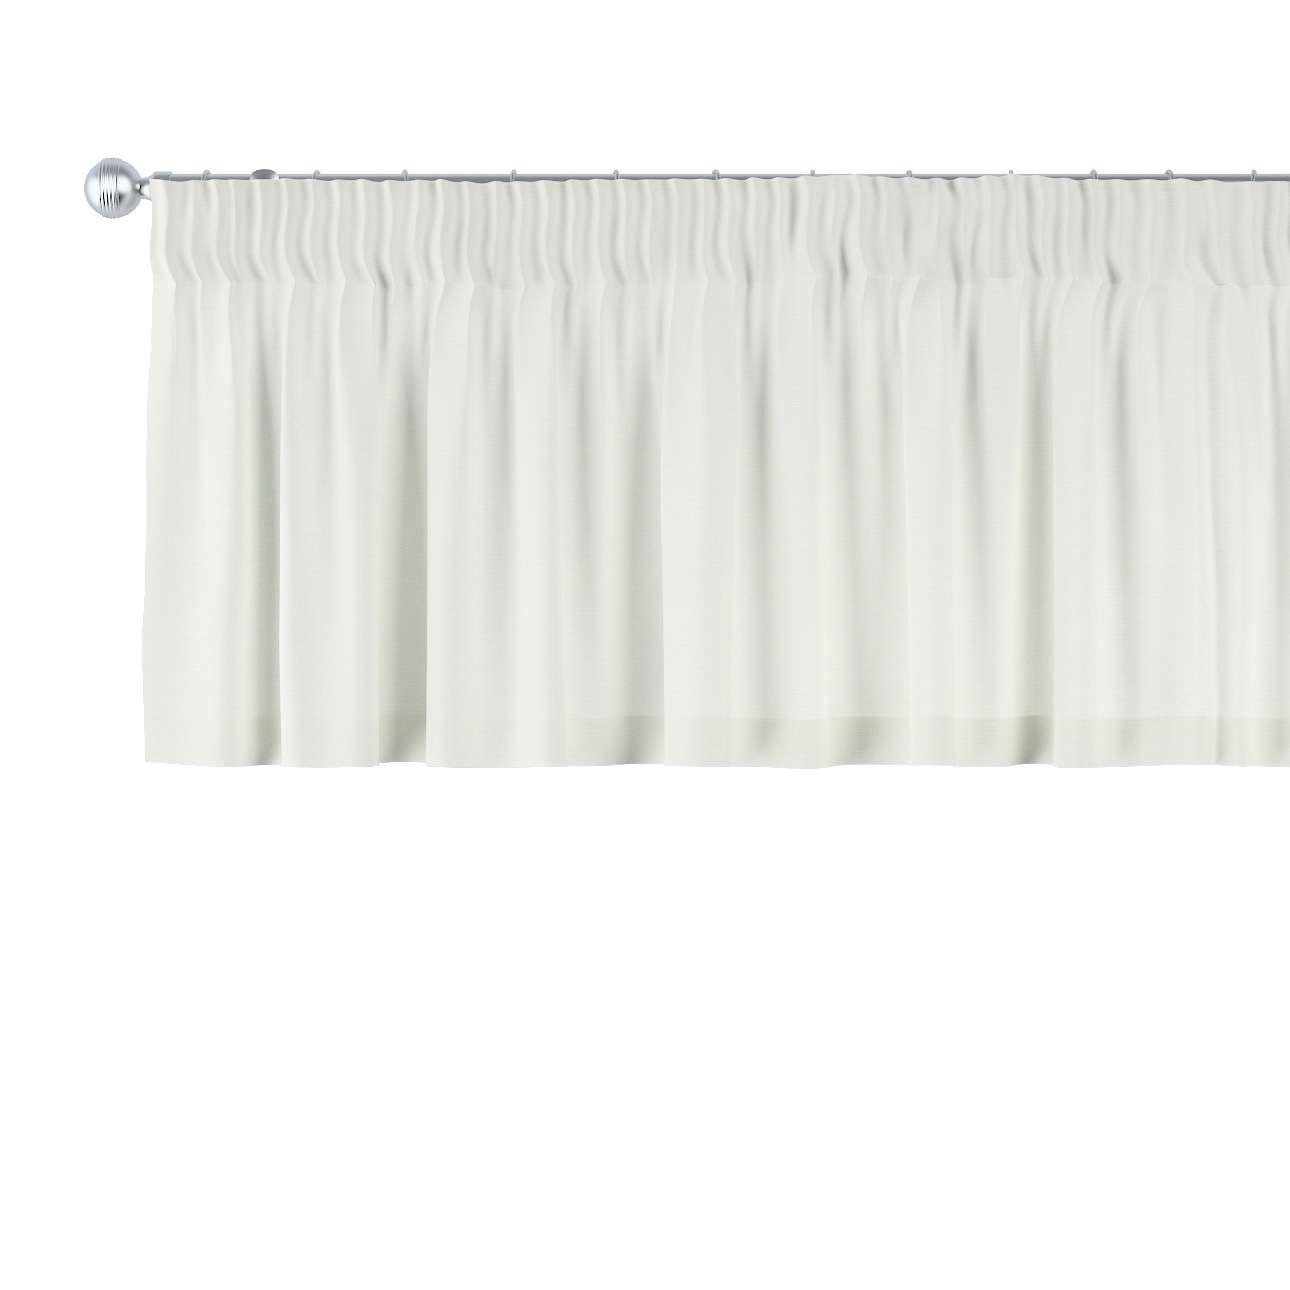 Pencil pleat pelmet 130 x 40 cm (51 x 16 inch) in collection Jupiter, fabric: 127-00